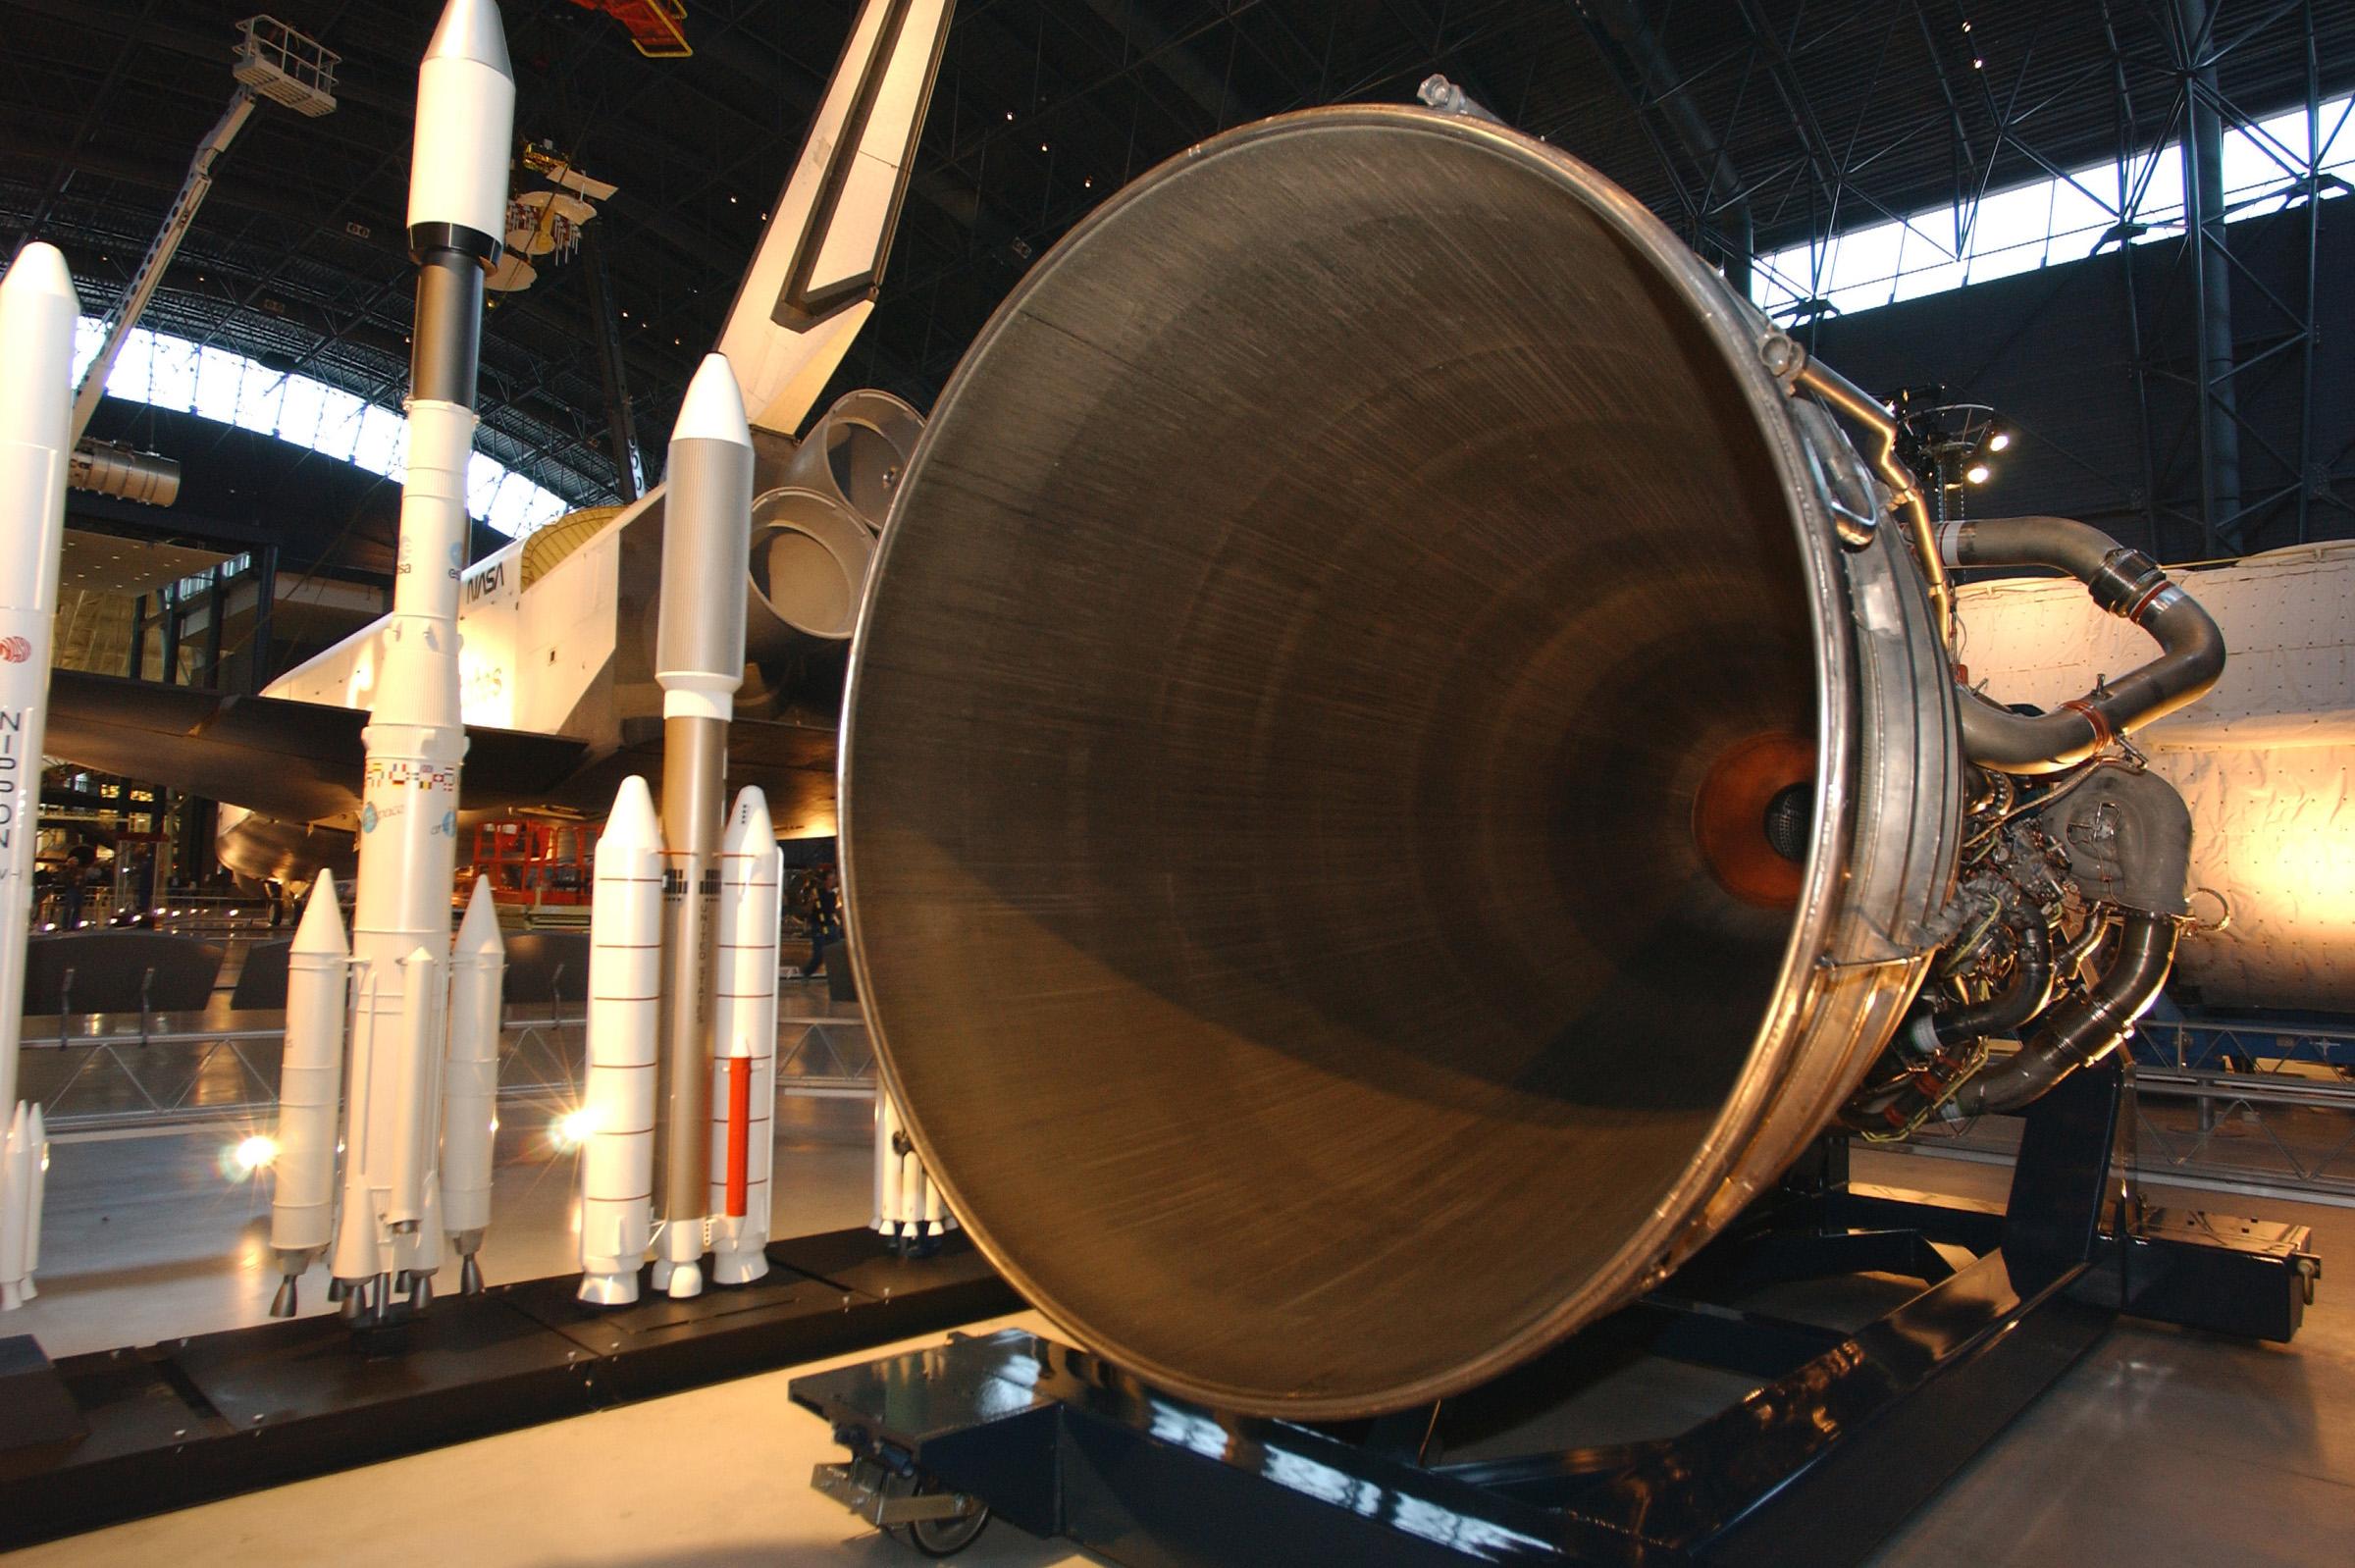 apollo the space shuttle - photo #36